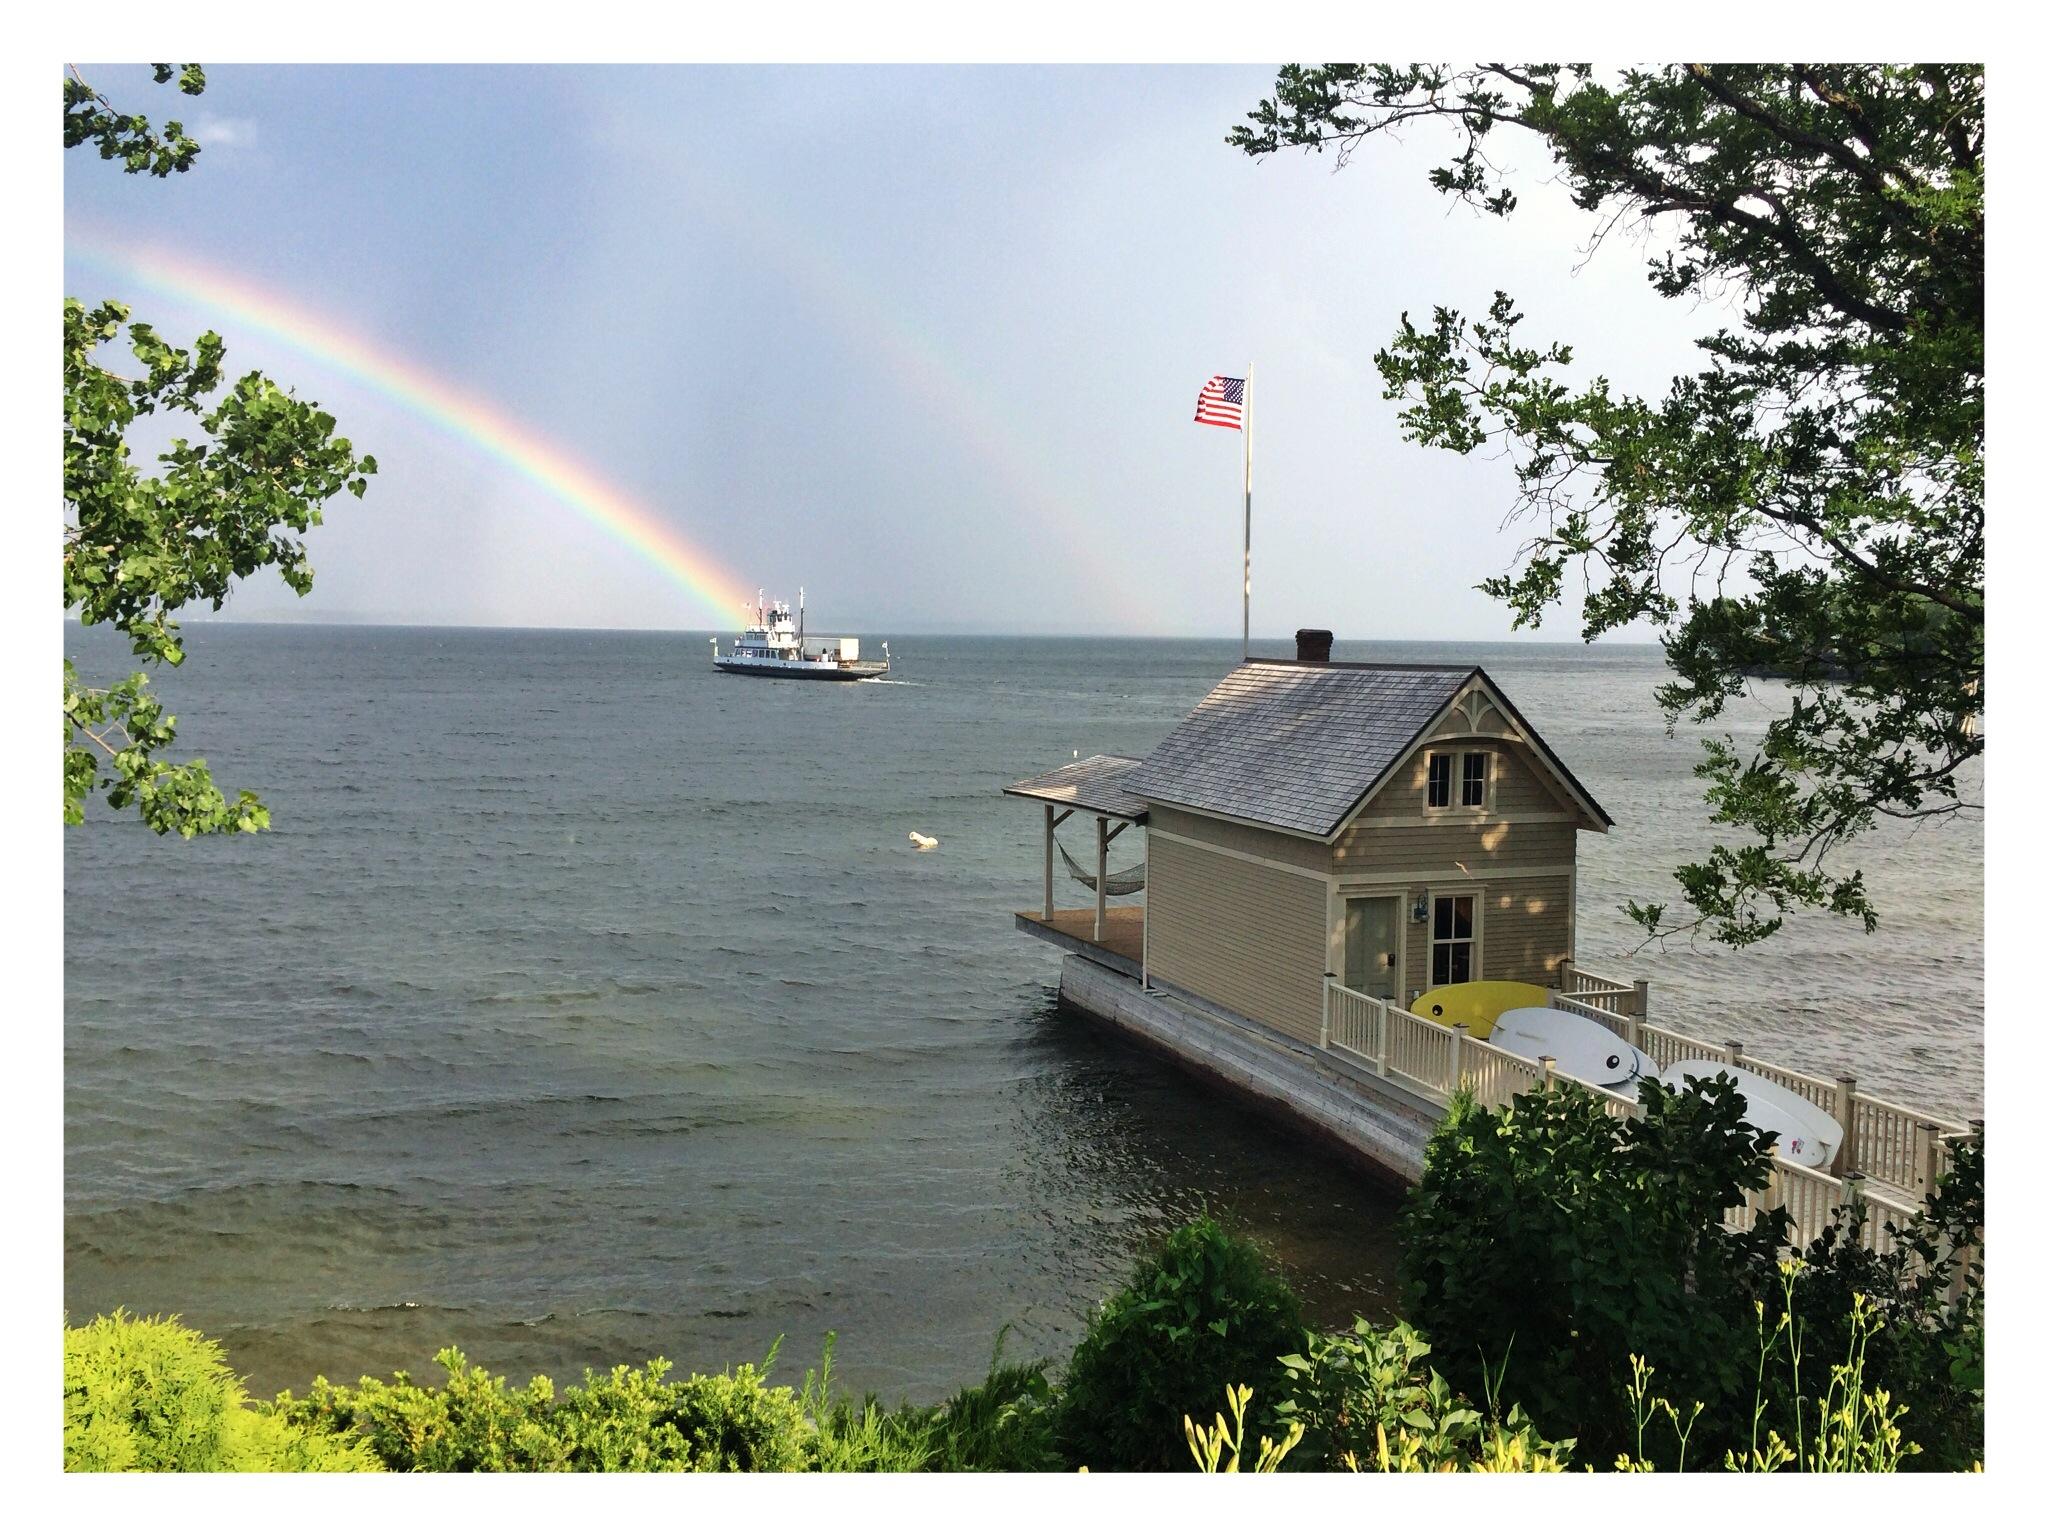 Boathouse, Ferry & Rainbow